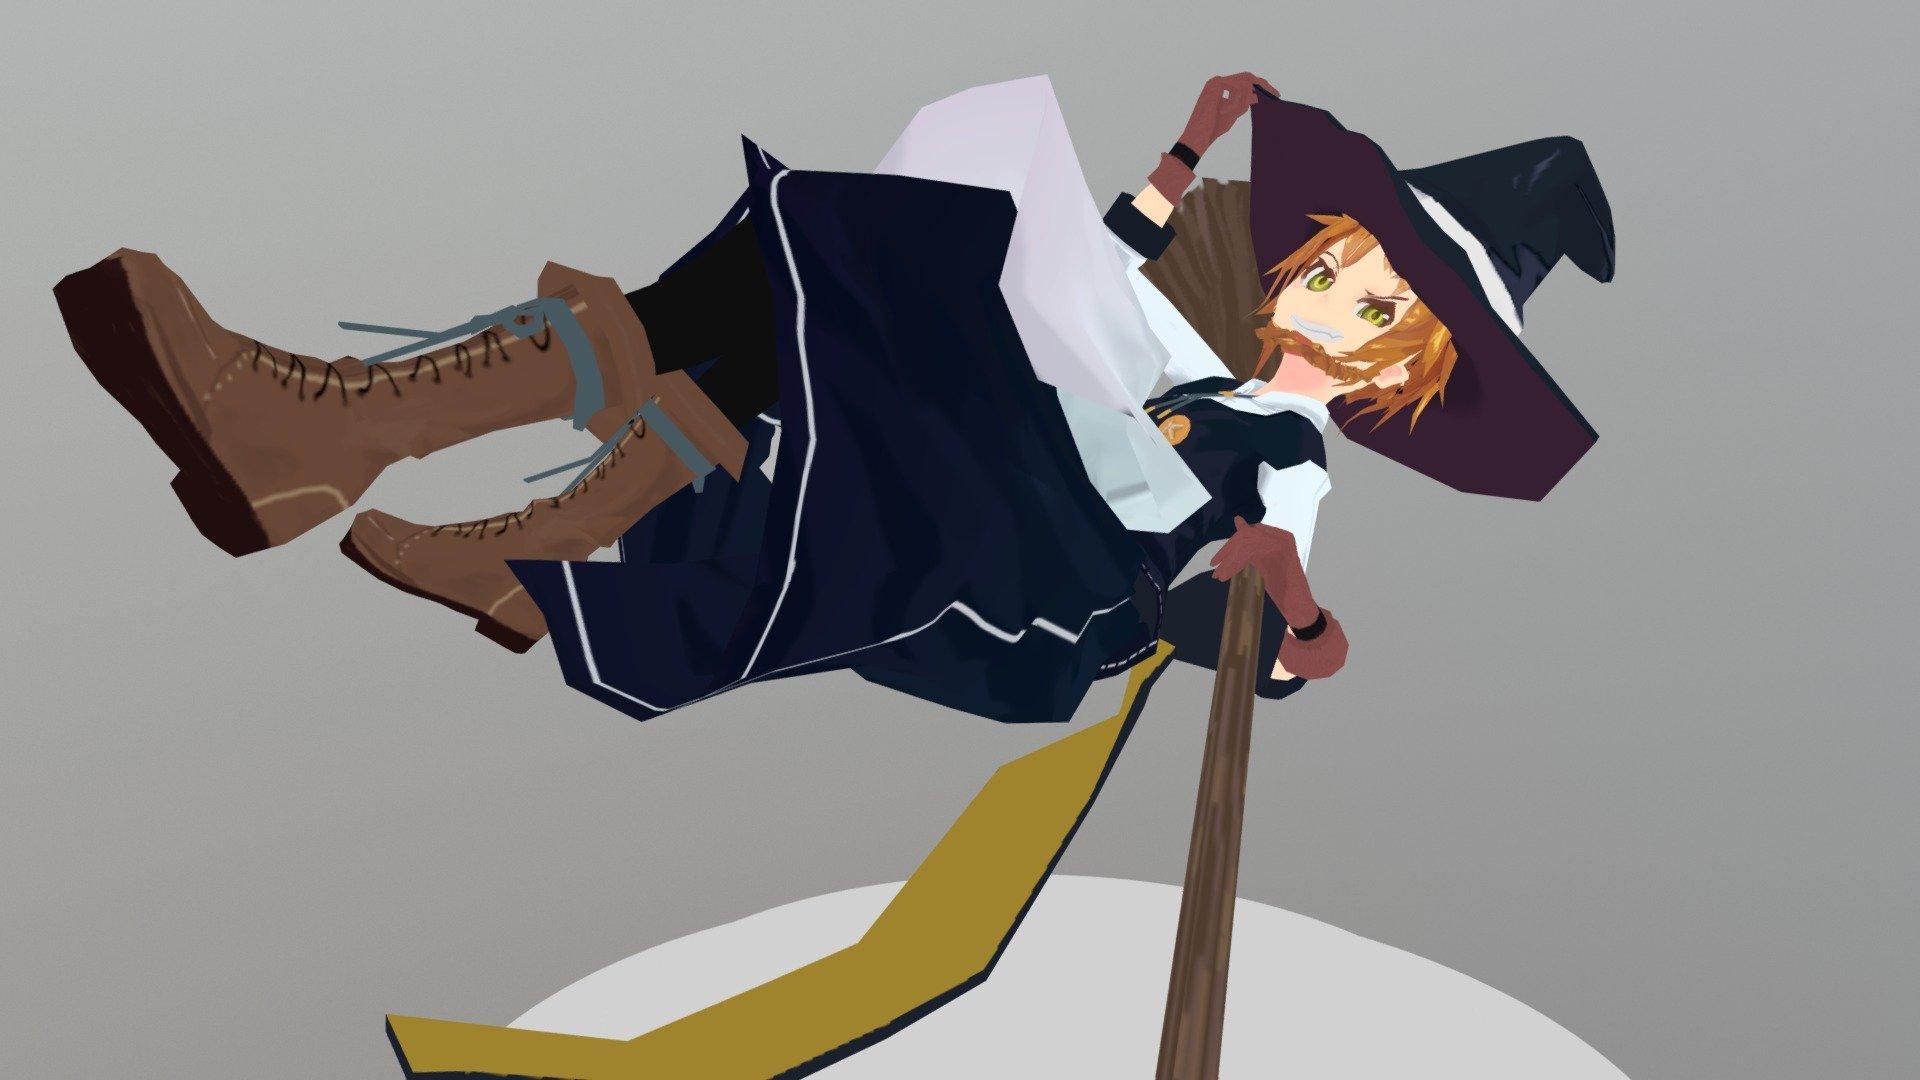 Touhou 霧雨魔理沙 Marisa Kirisame 3d Model By 白井うどん Shiroi